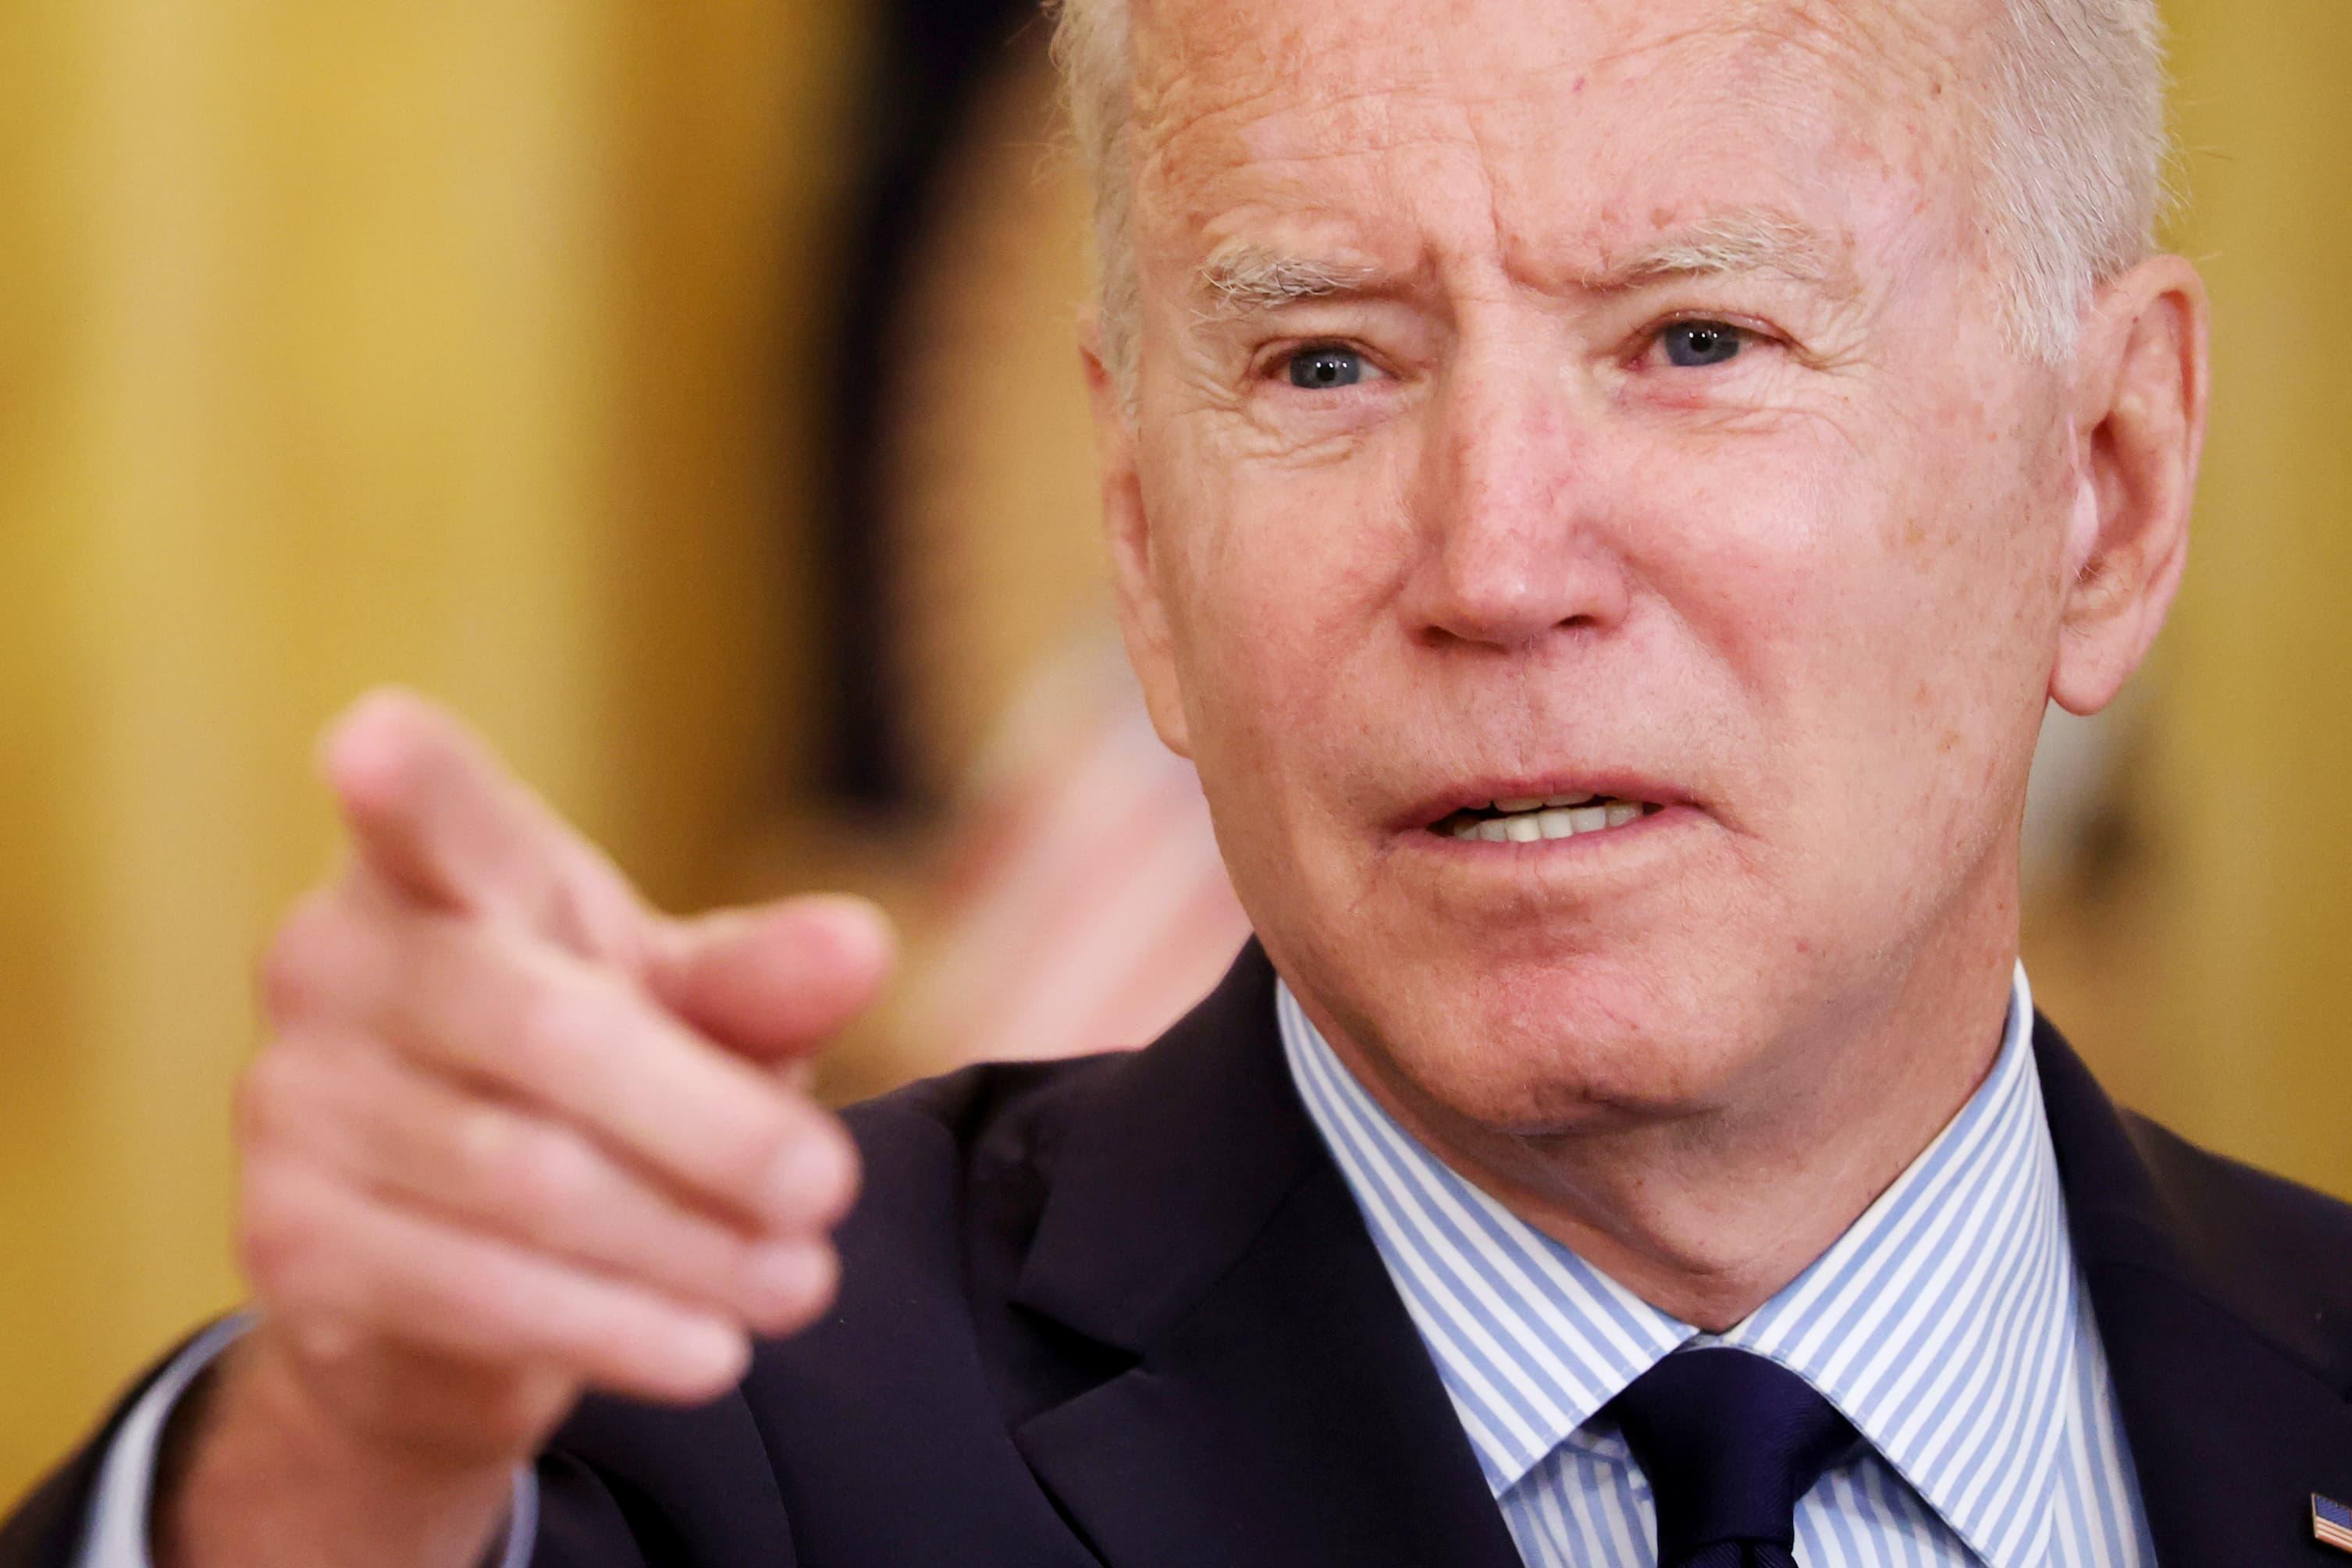 As Biden leads infrastructure talks, odds of a bipartisan deal look bleak